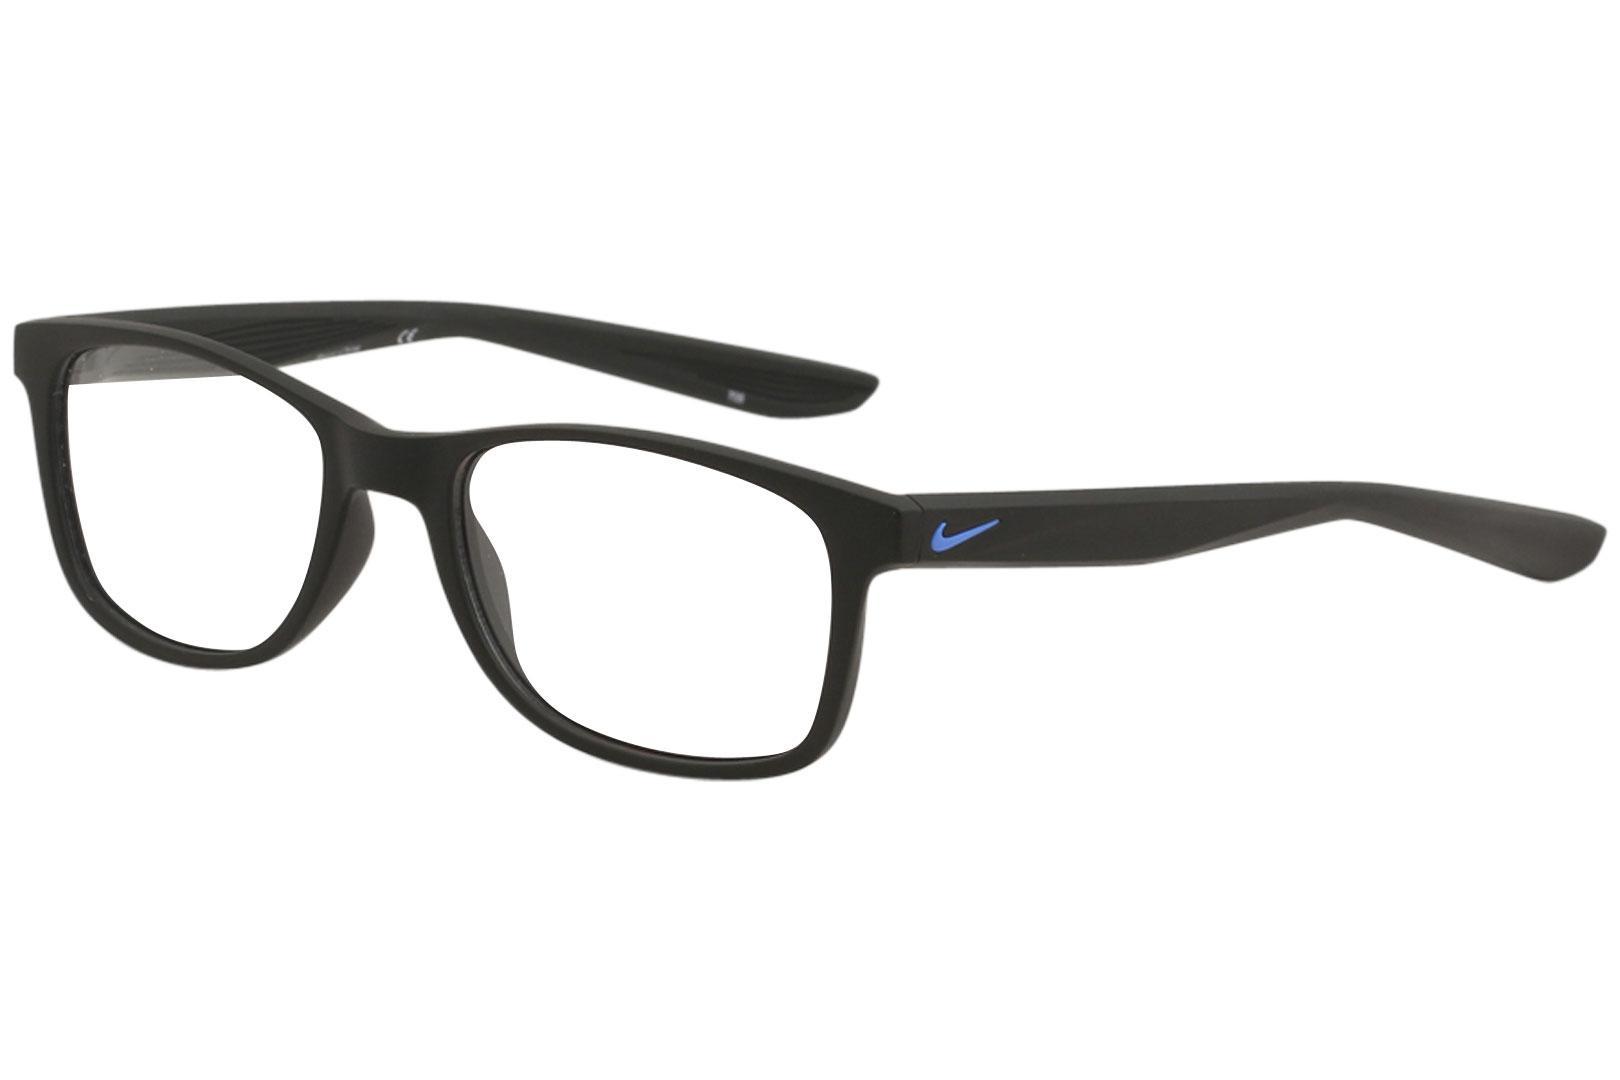 1866756e4a Nike Youth Boy s Eyeglasses 5004 Full Rim Optical Frame